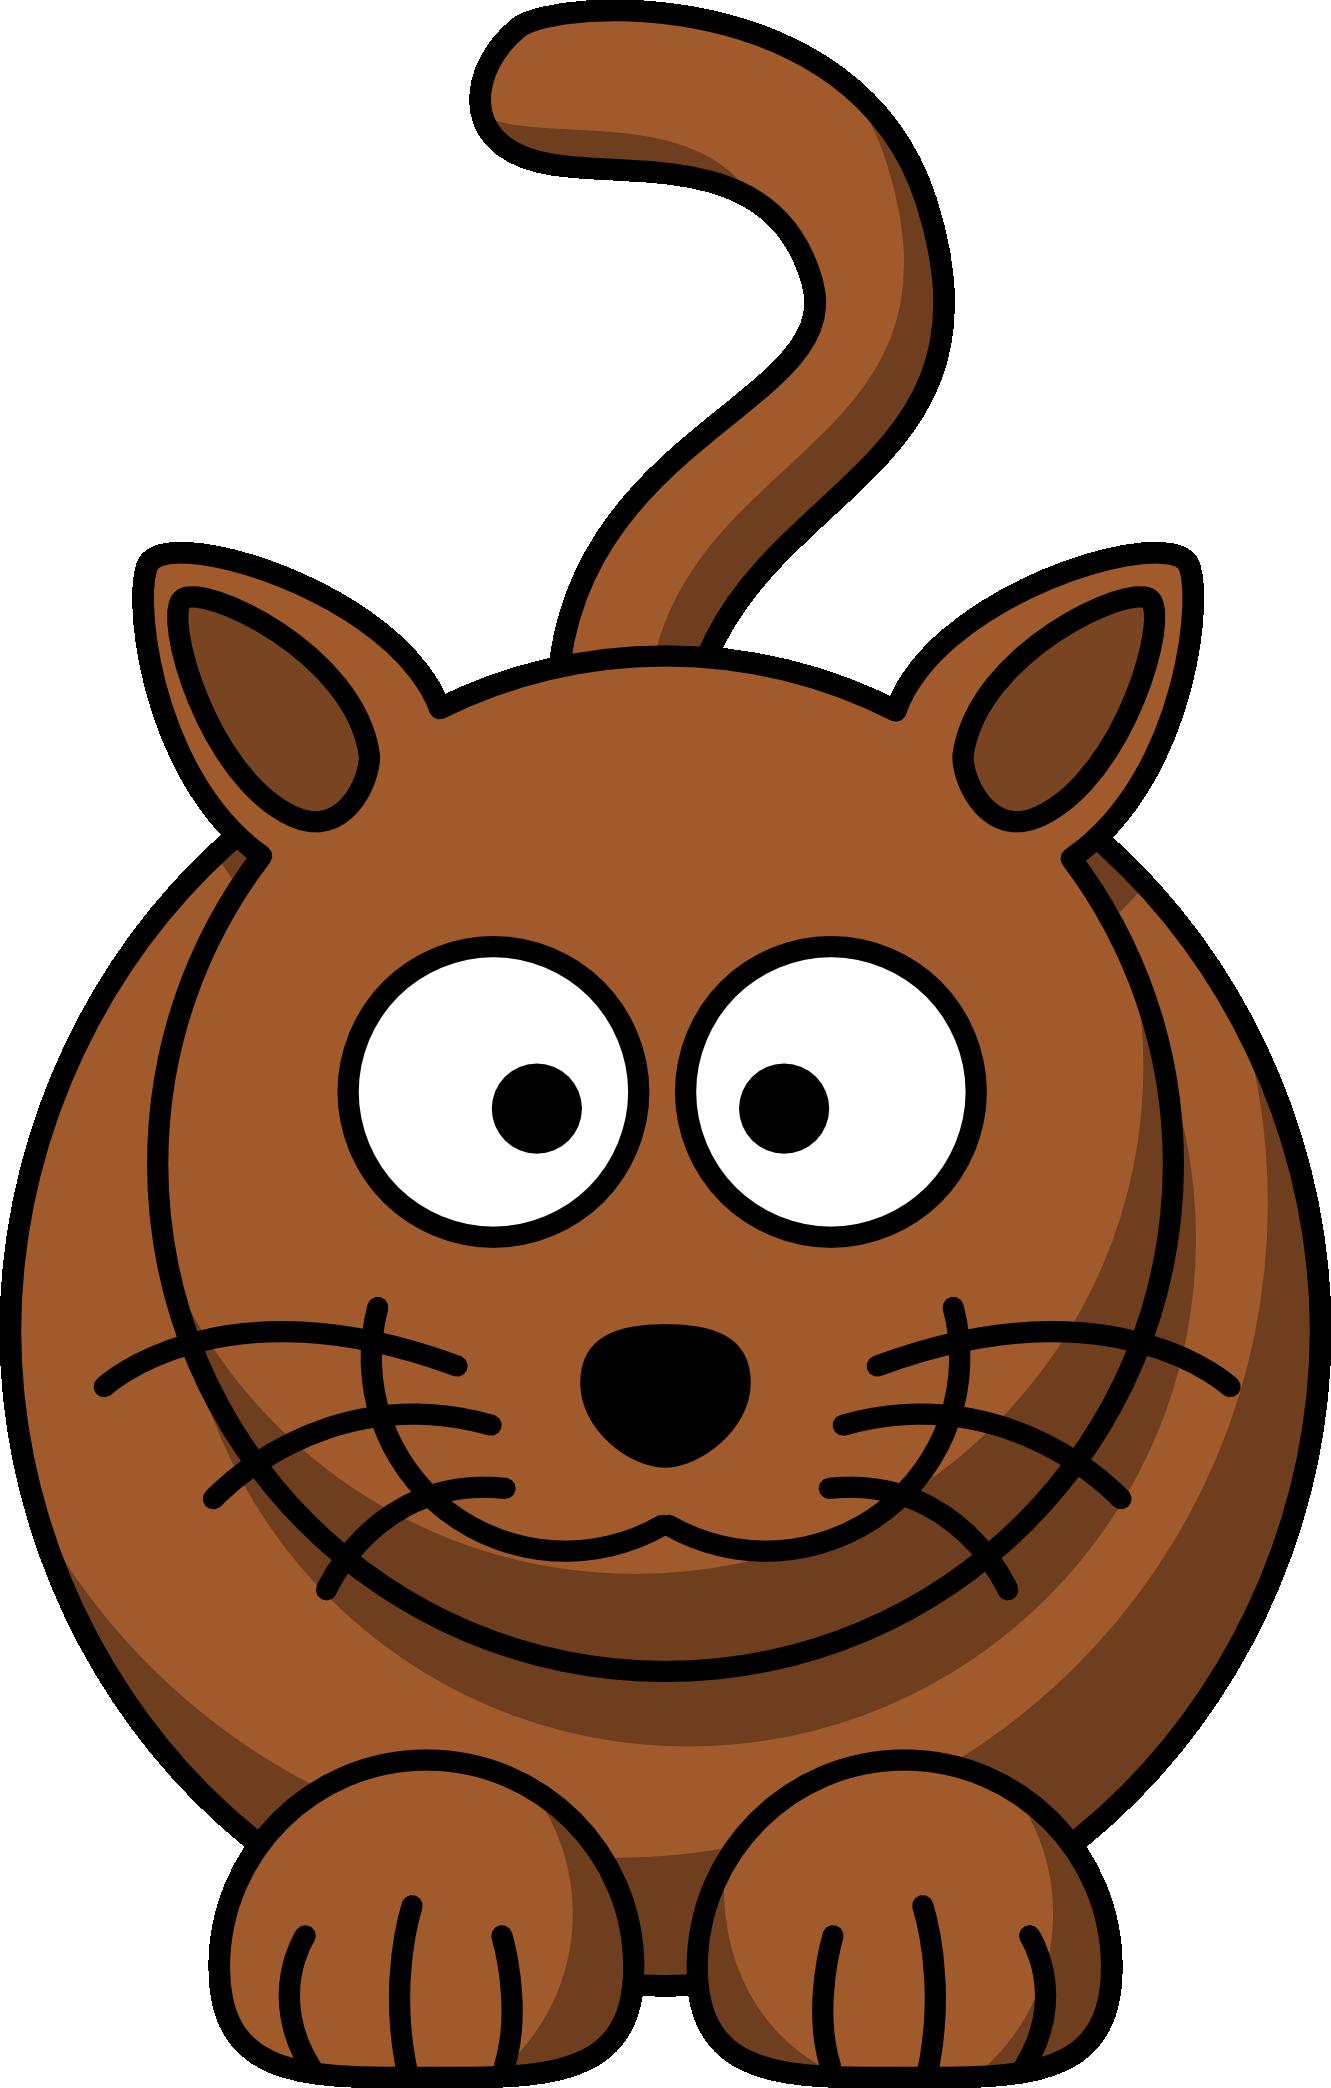 free png Cat Clipart images transparent